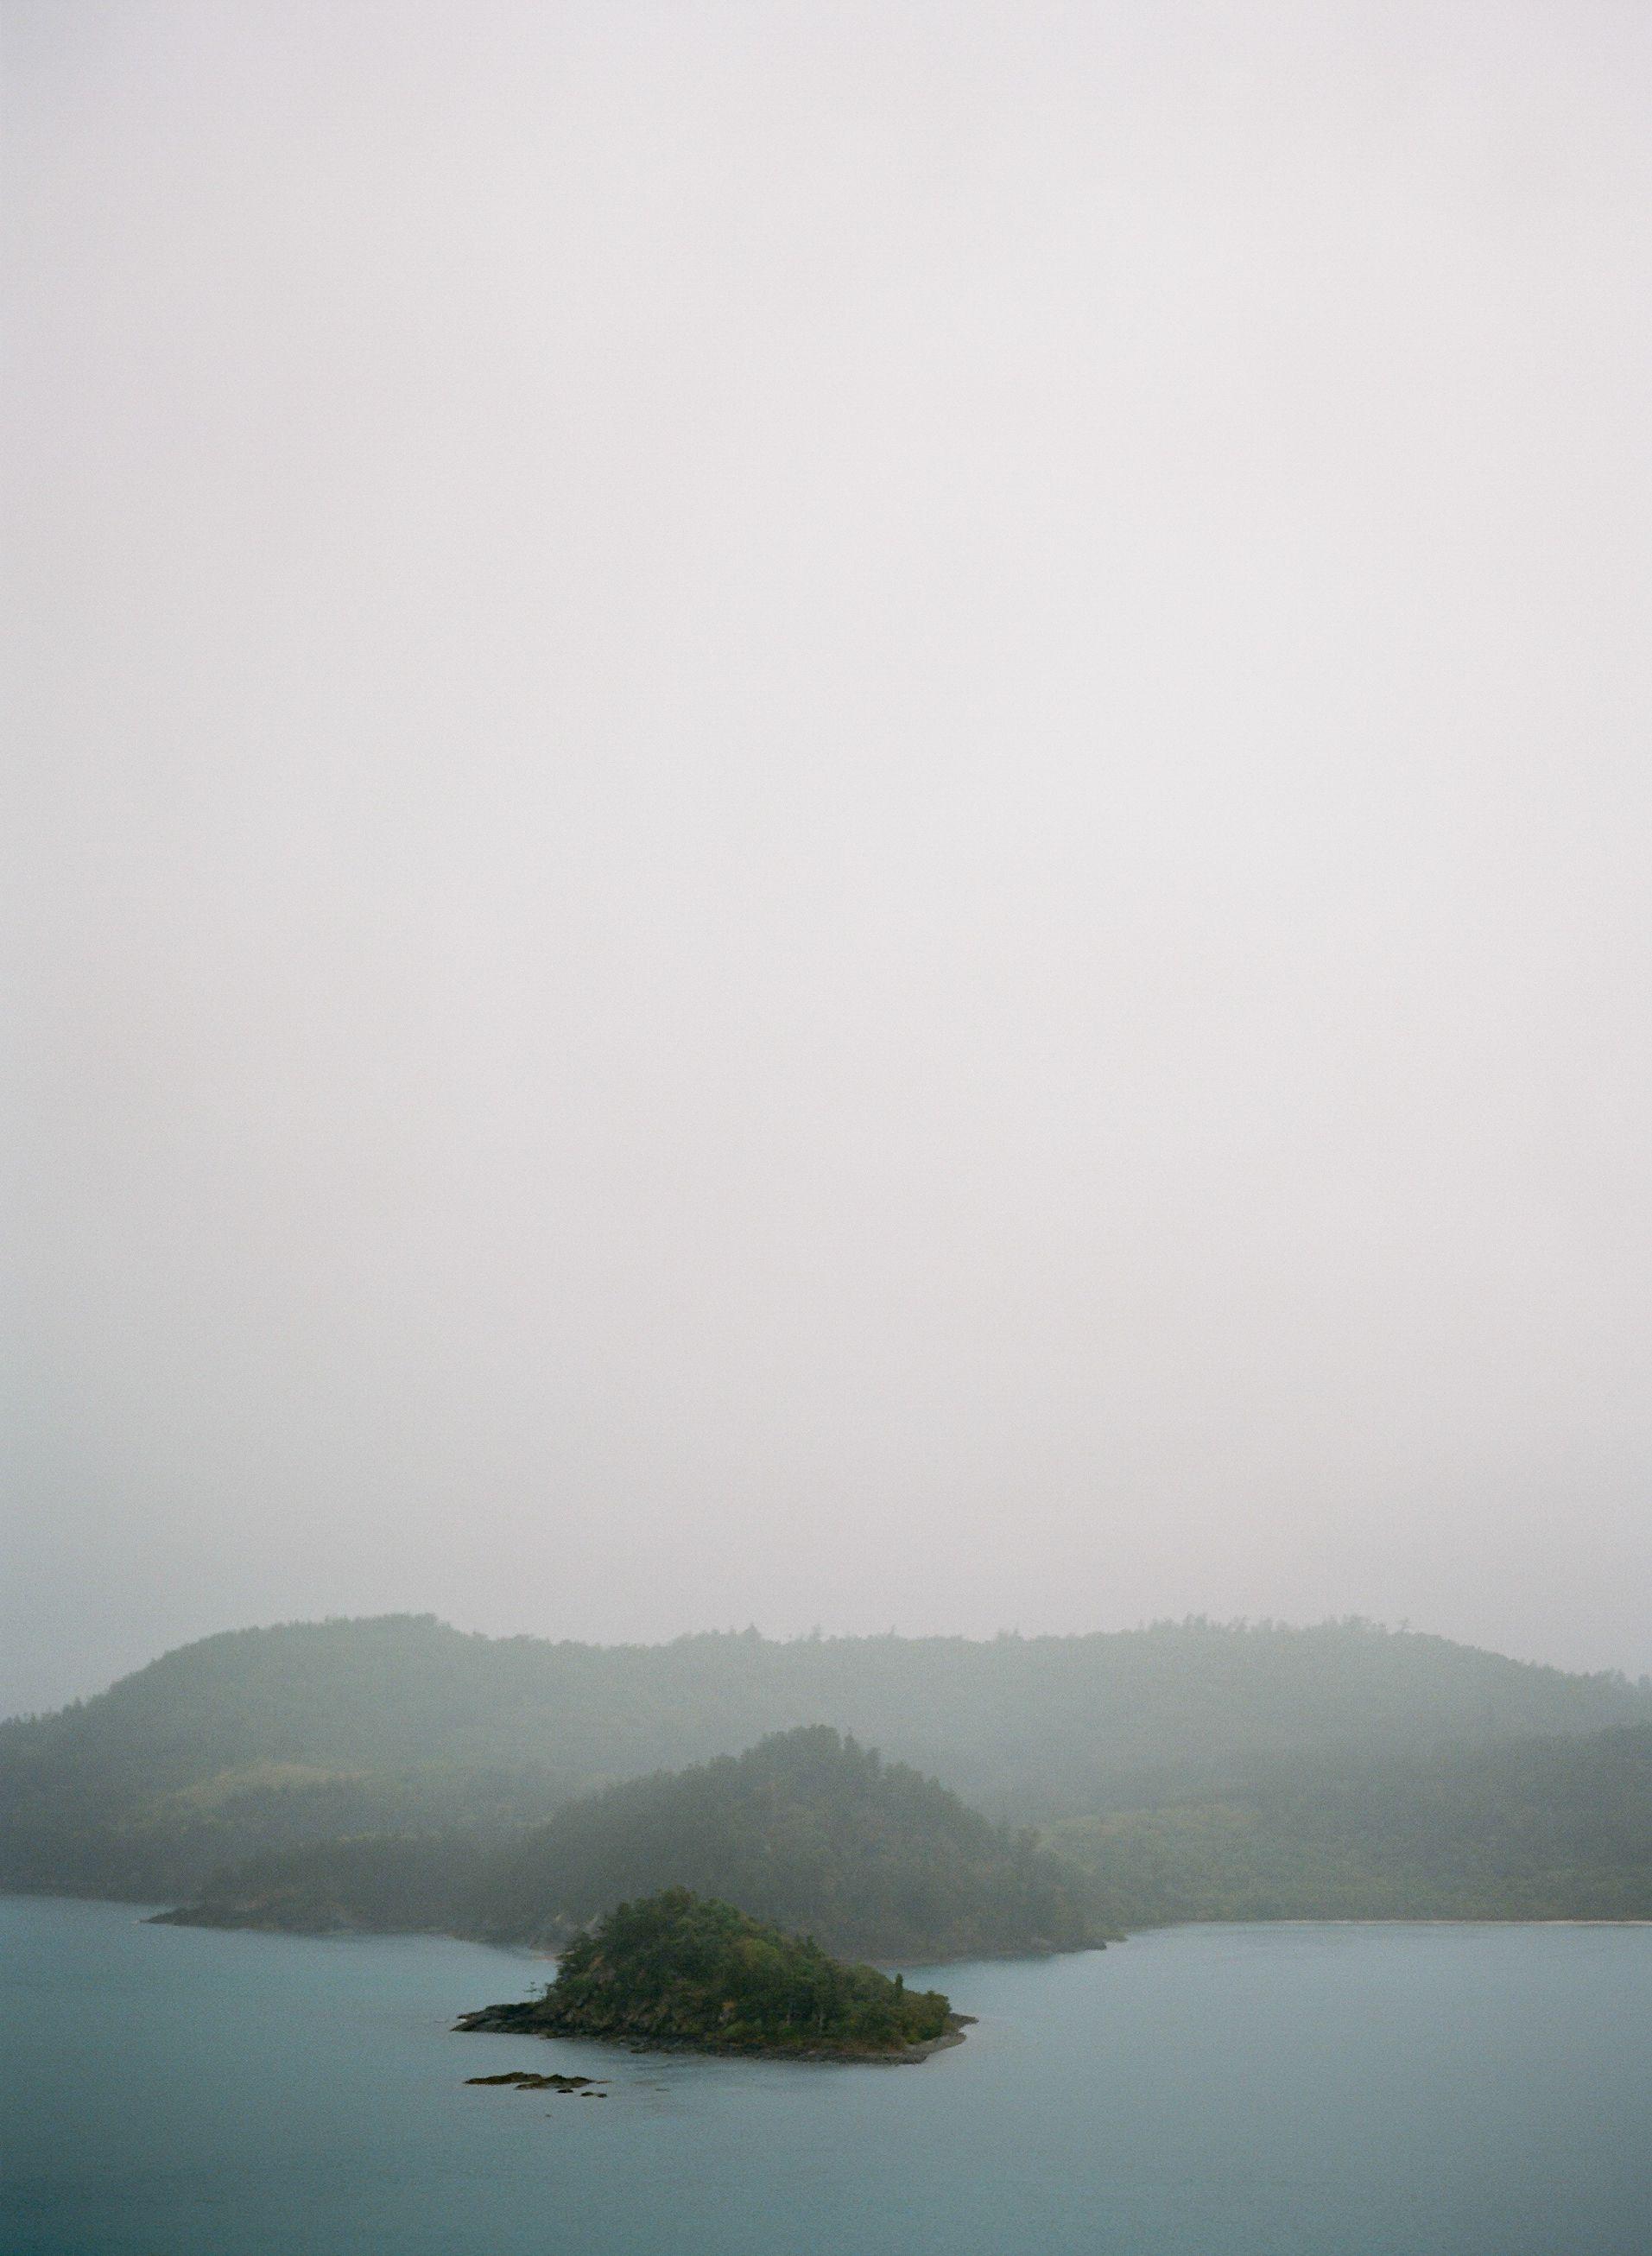 Blog — the rare negatives www.therarenegatives.com #therarenegatives #hamiltonisland #film #photography #travel #travelphotography